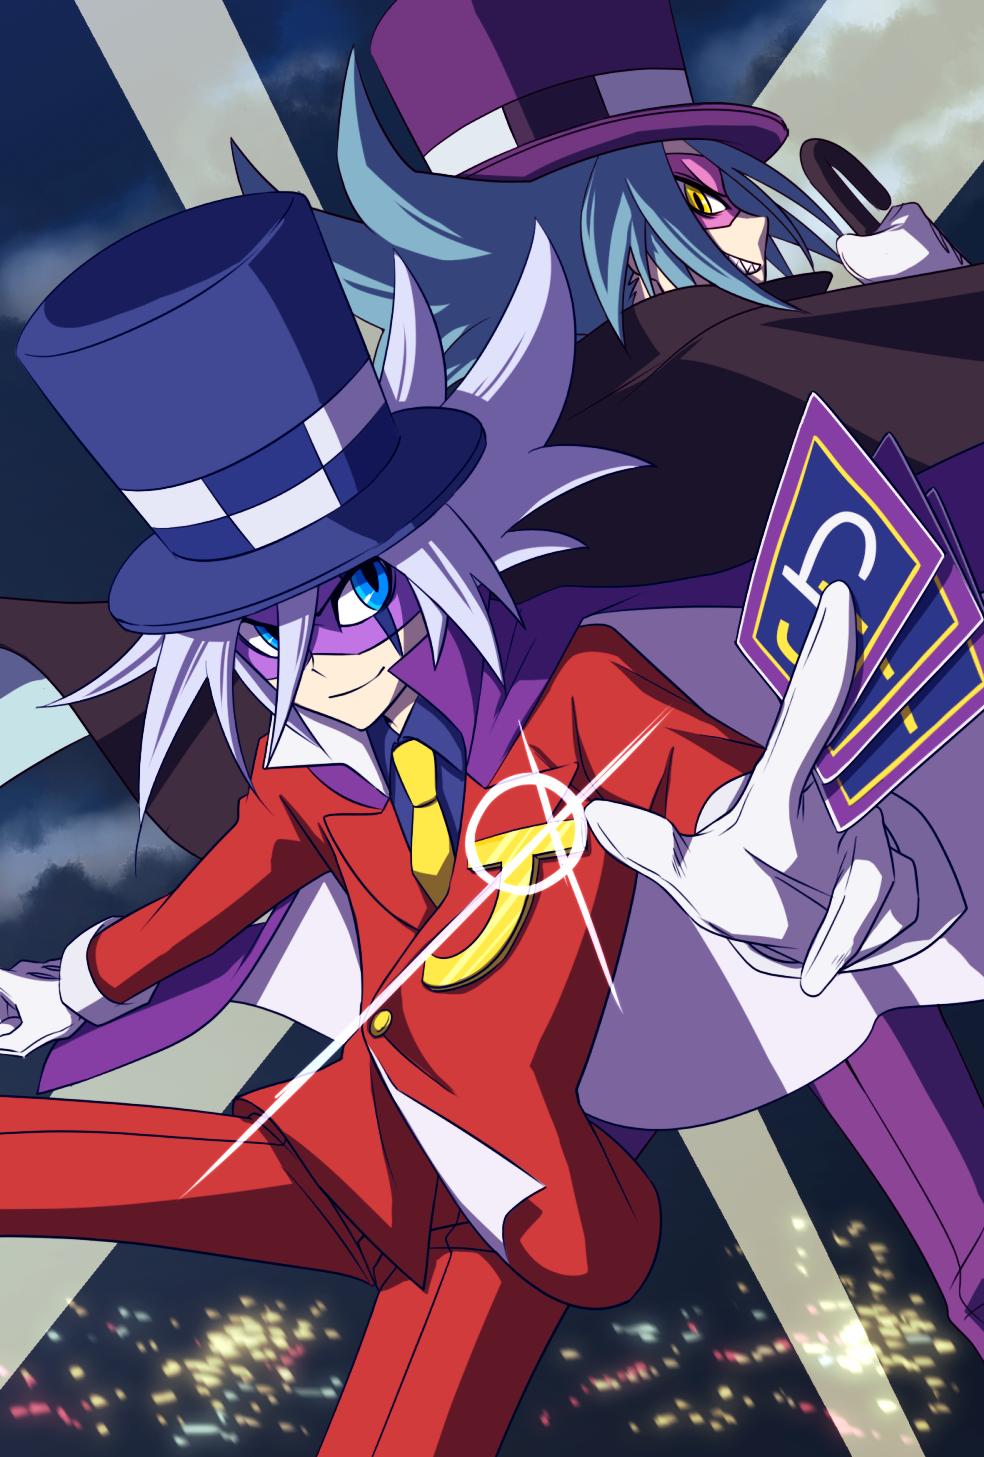 Kaitou Joker Image #1815613 - Zerochan Anime Image Board X 23 Cosplay Wallpaper